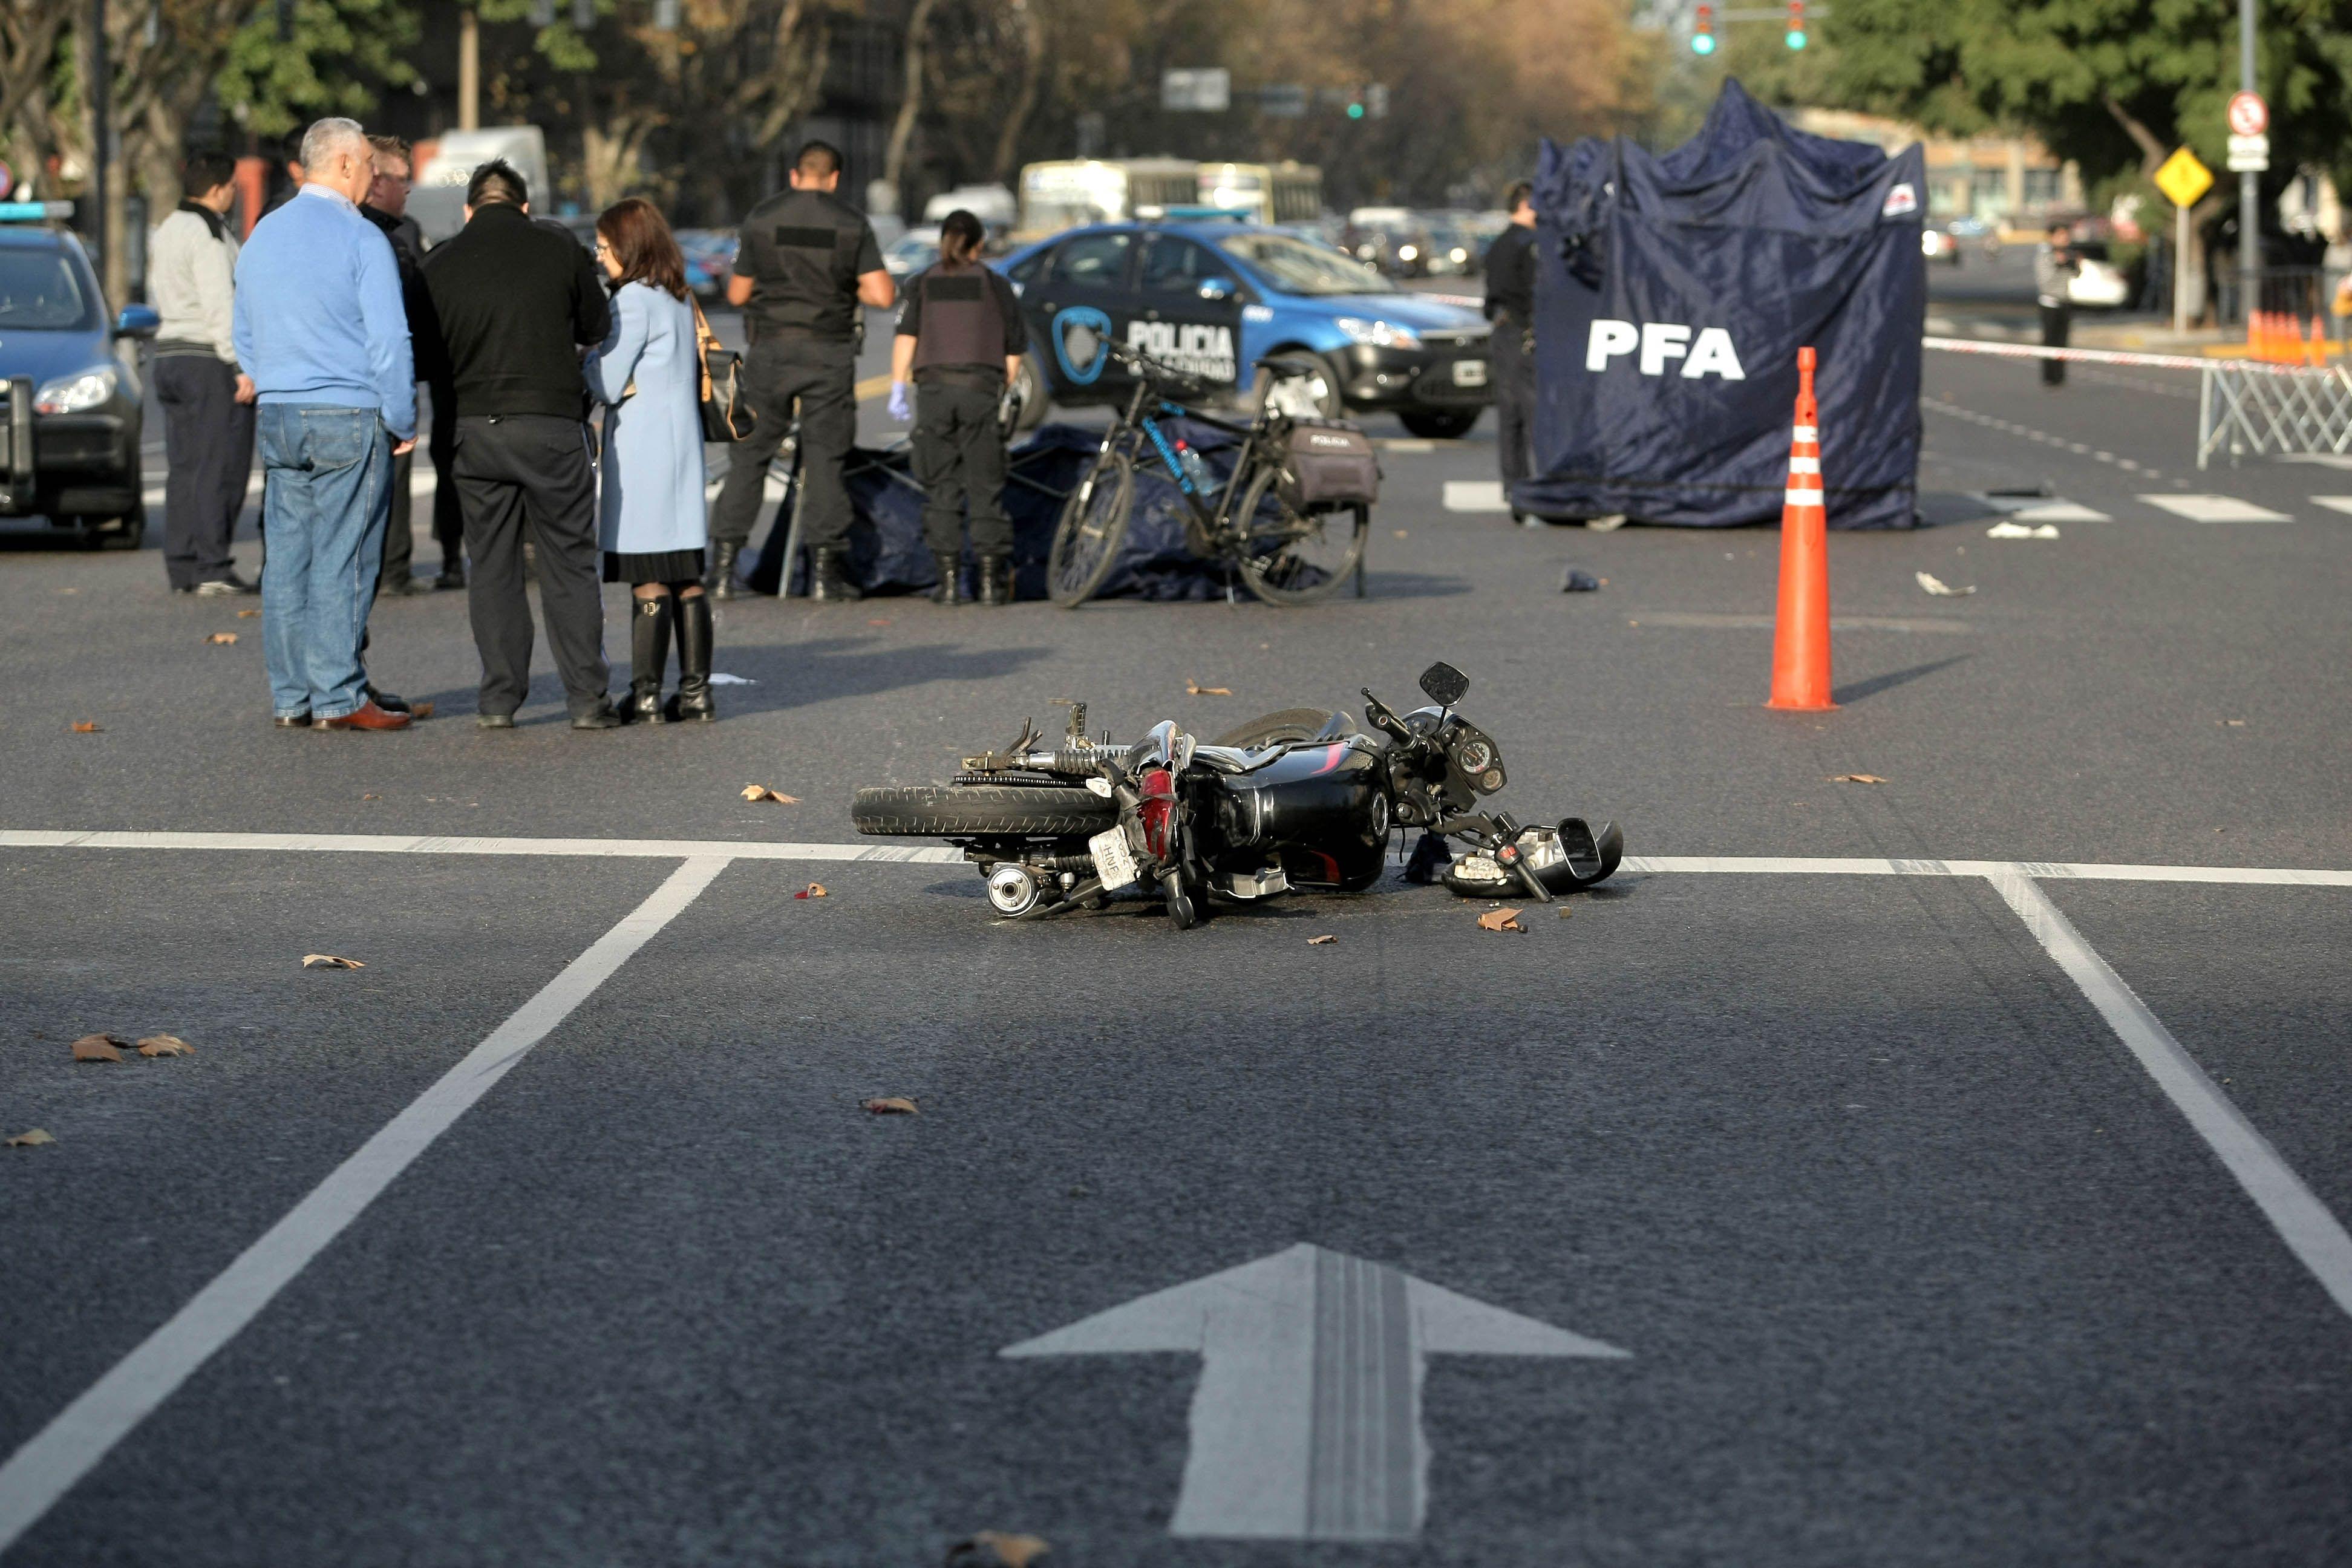 Dos motochorros muertos durante un robo en Retiro